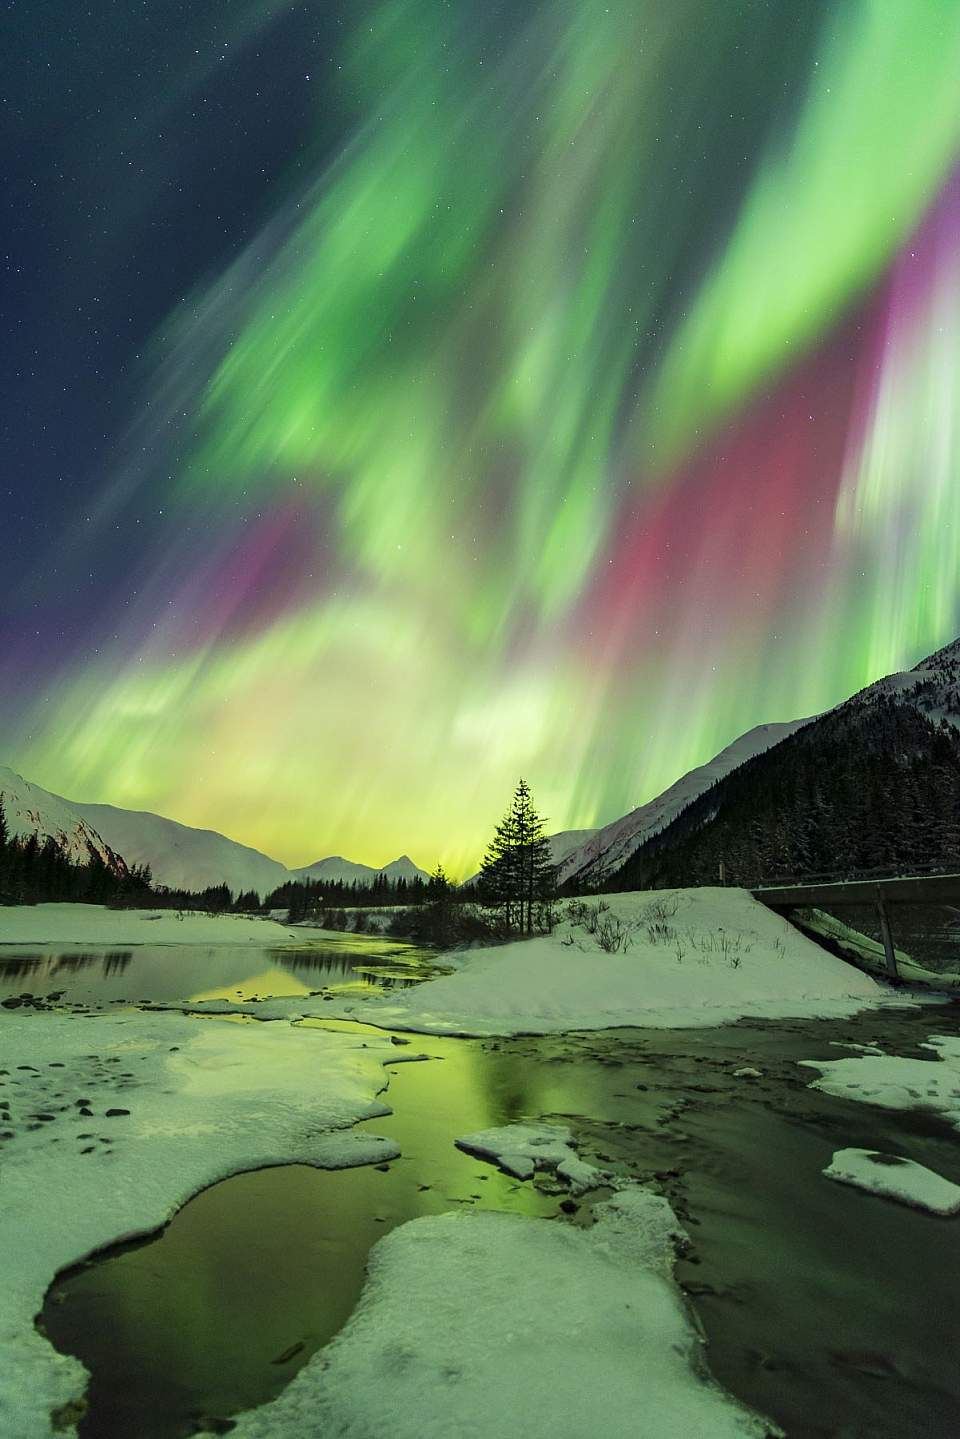 Carl Johnson northern lights Portage Valley 0313 CHNF AK 1231 Edit